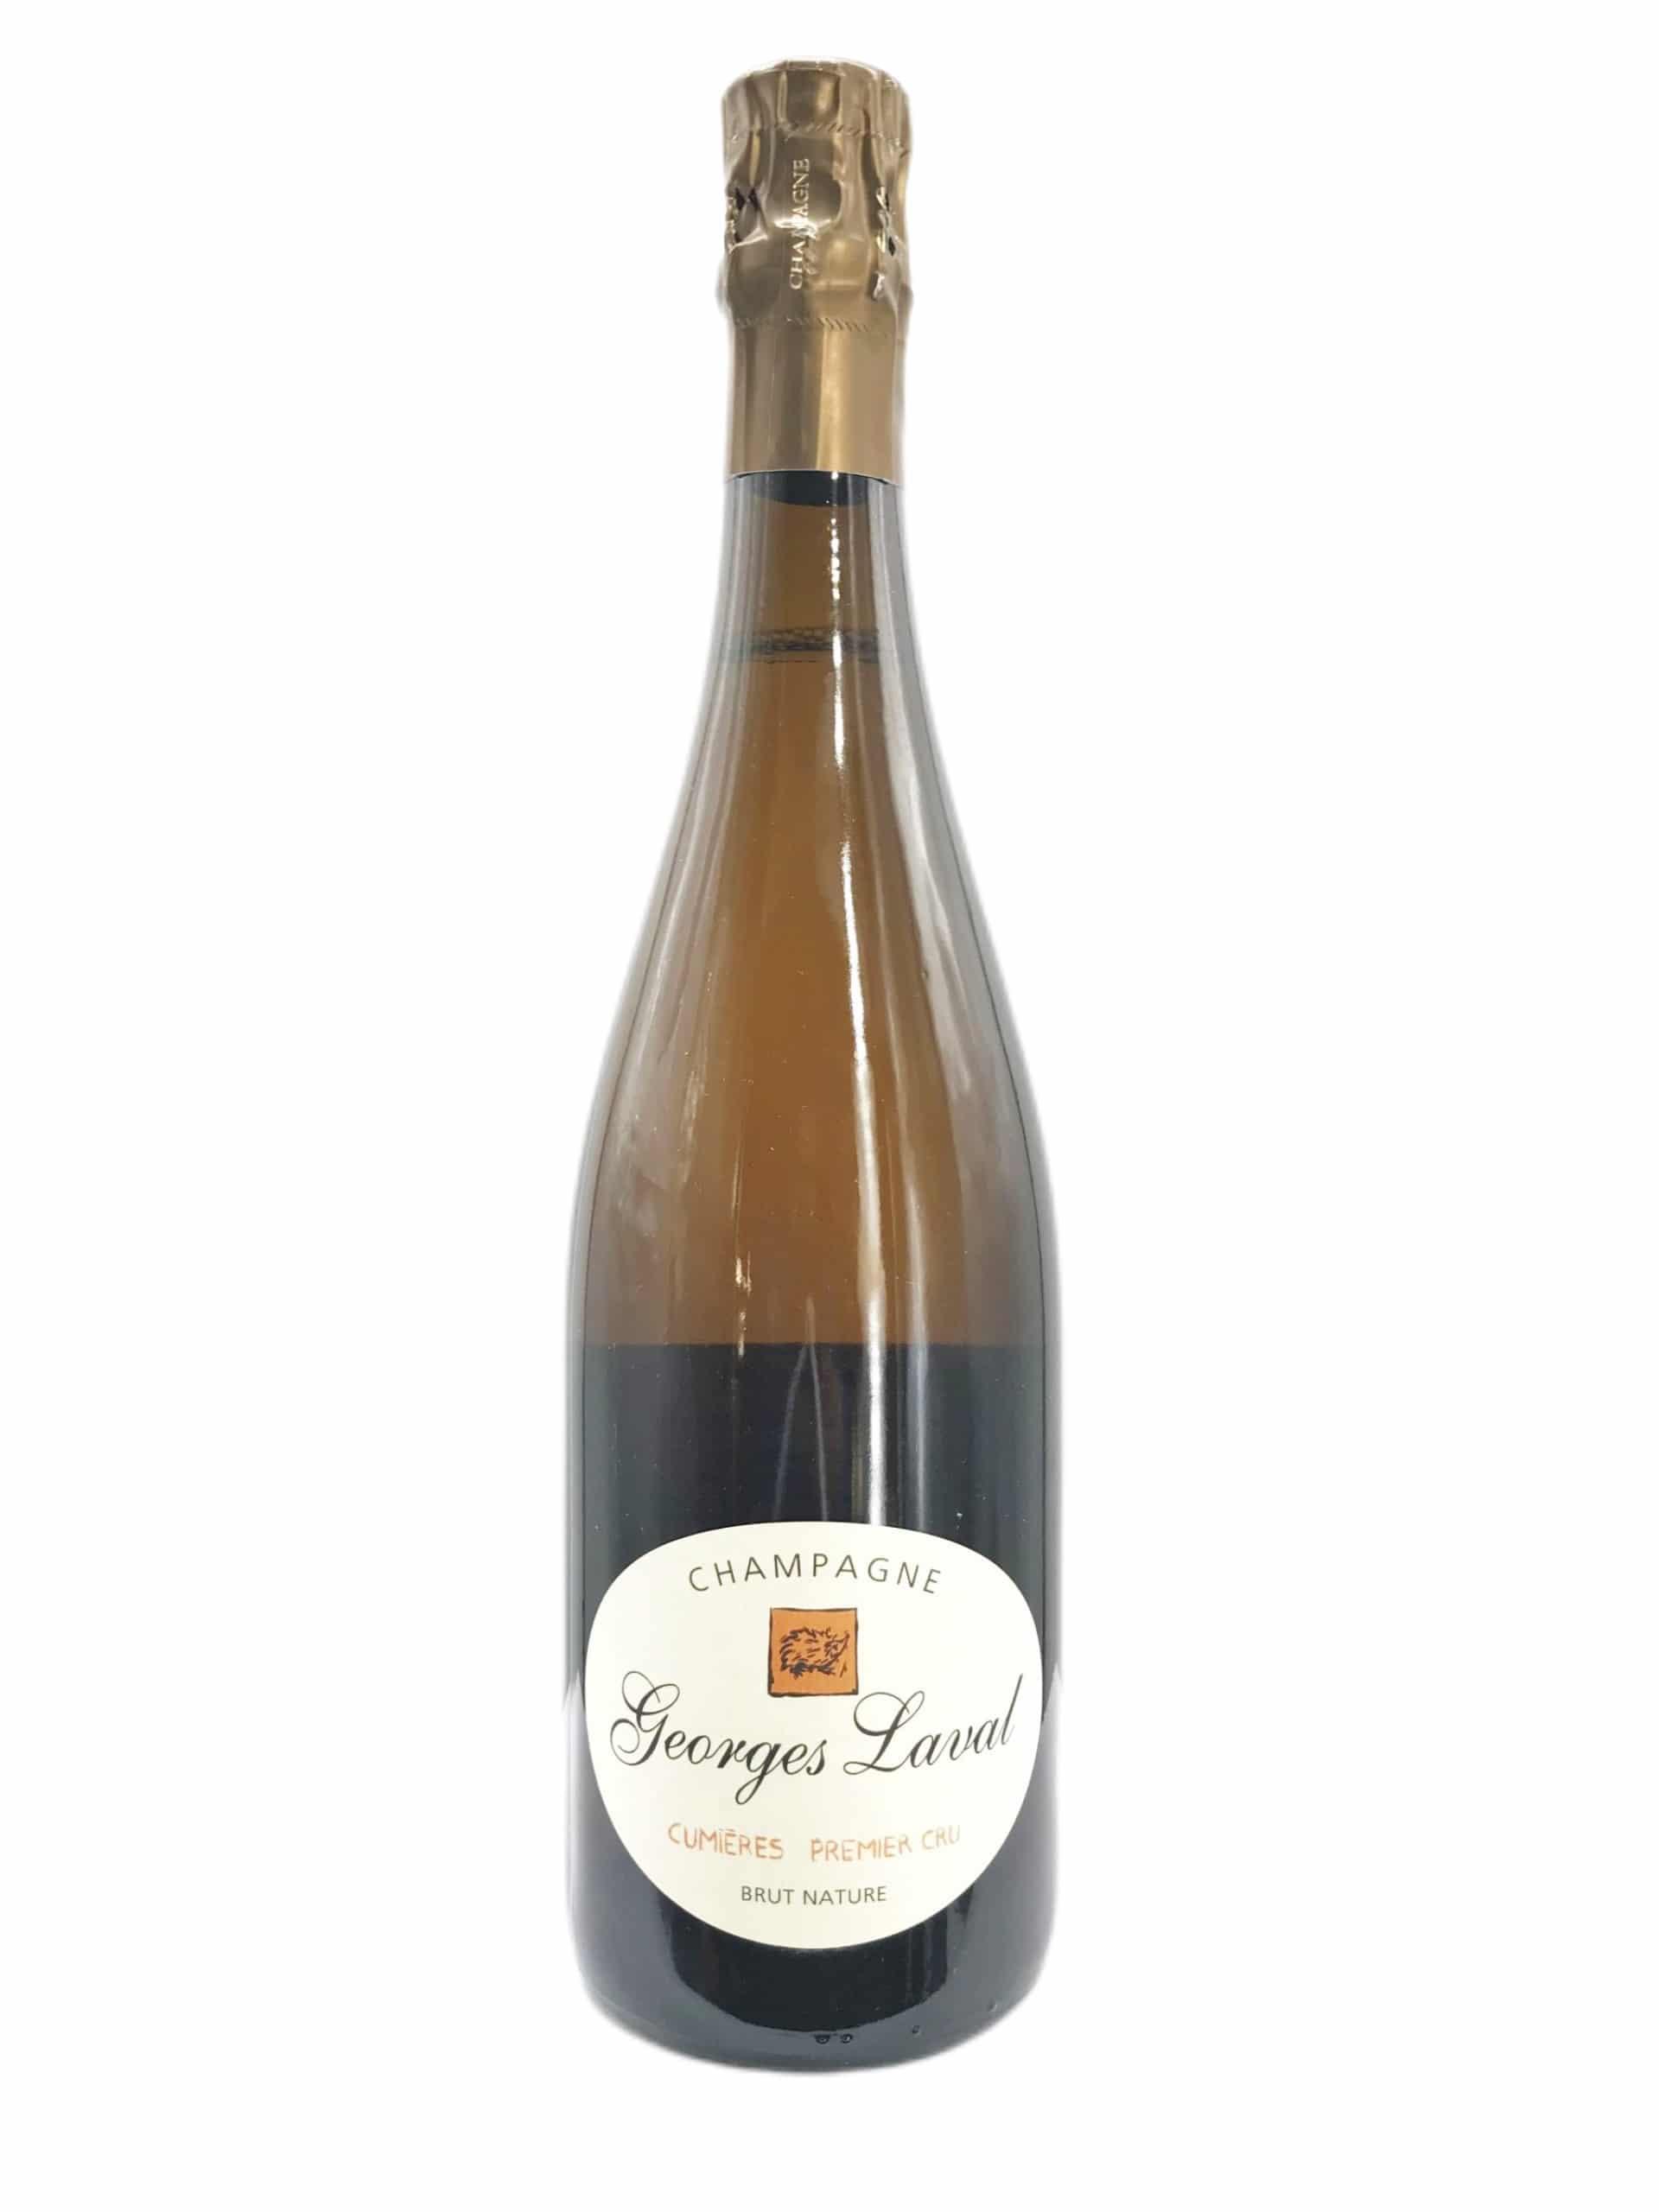 Champagne Georges Laval Cumieres Premier Cru